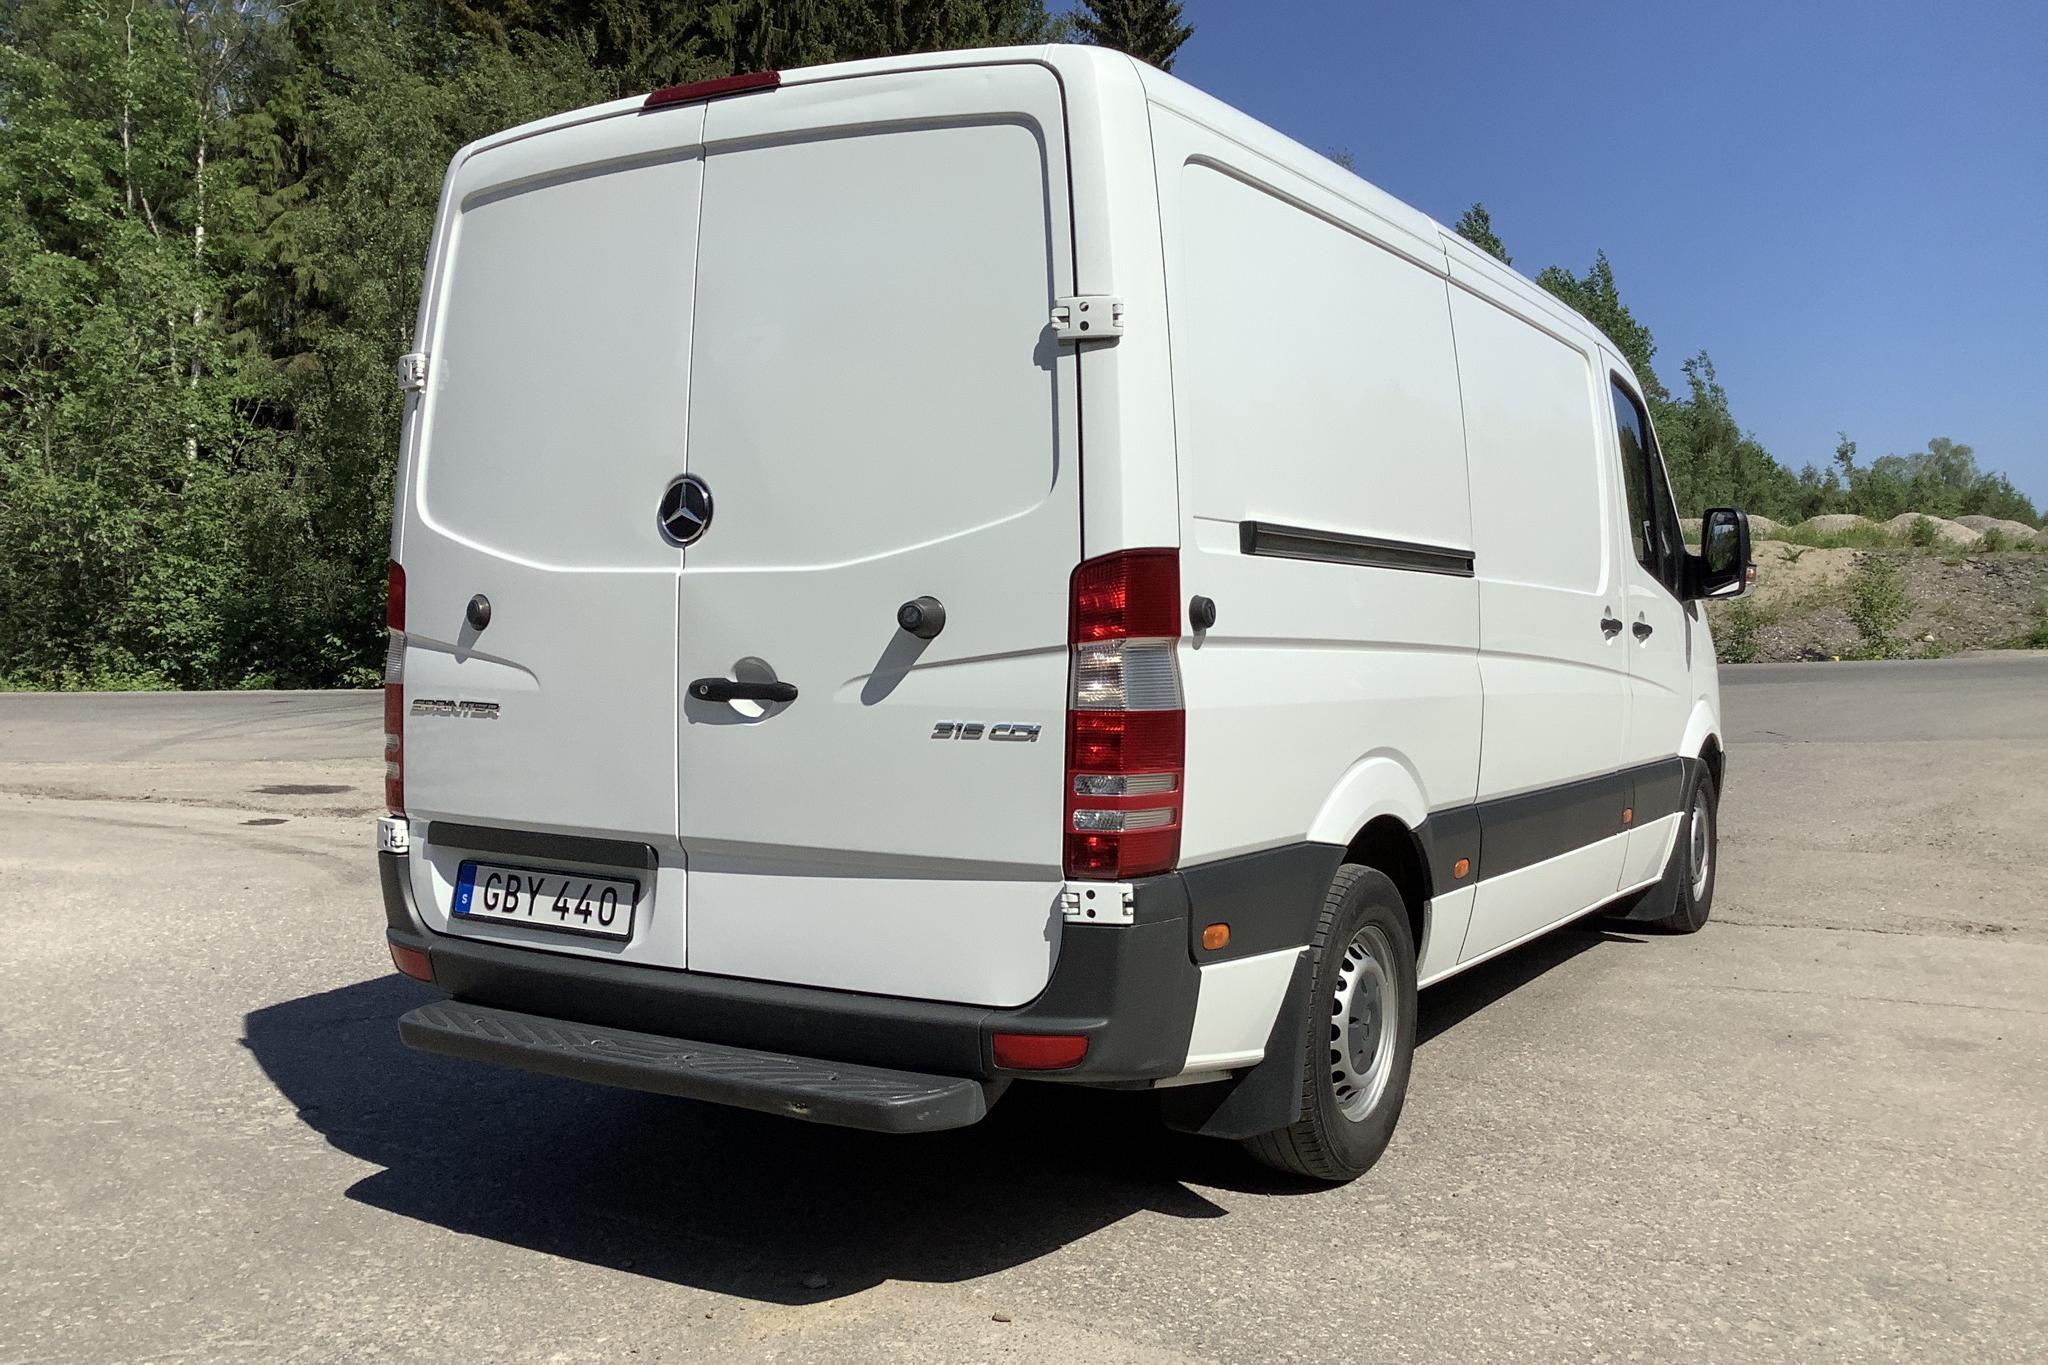 Mercedes Sprinter 316 CDI (163hk) - 24 691 mil - Manuell - vit - 2017